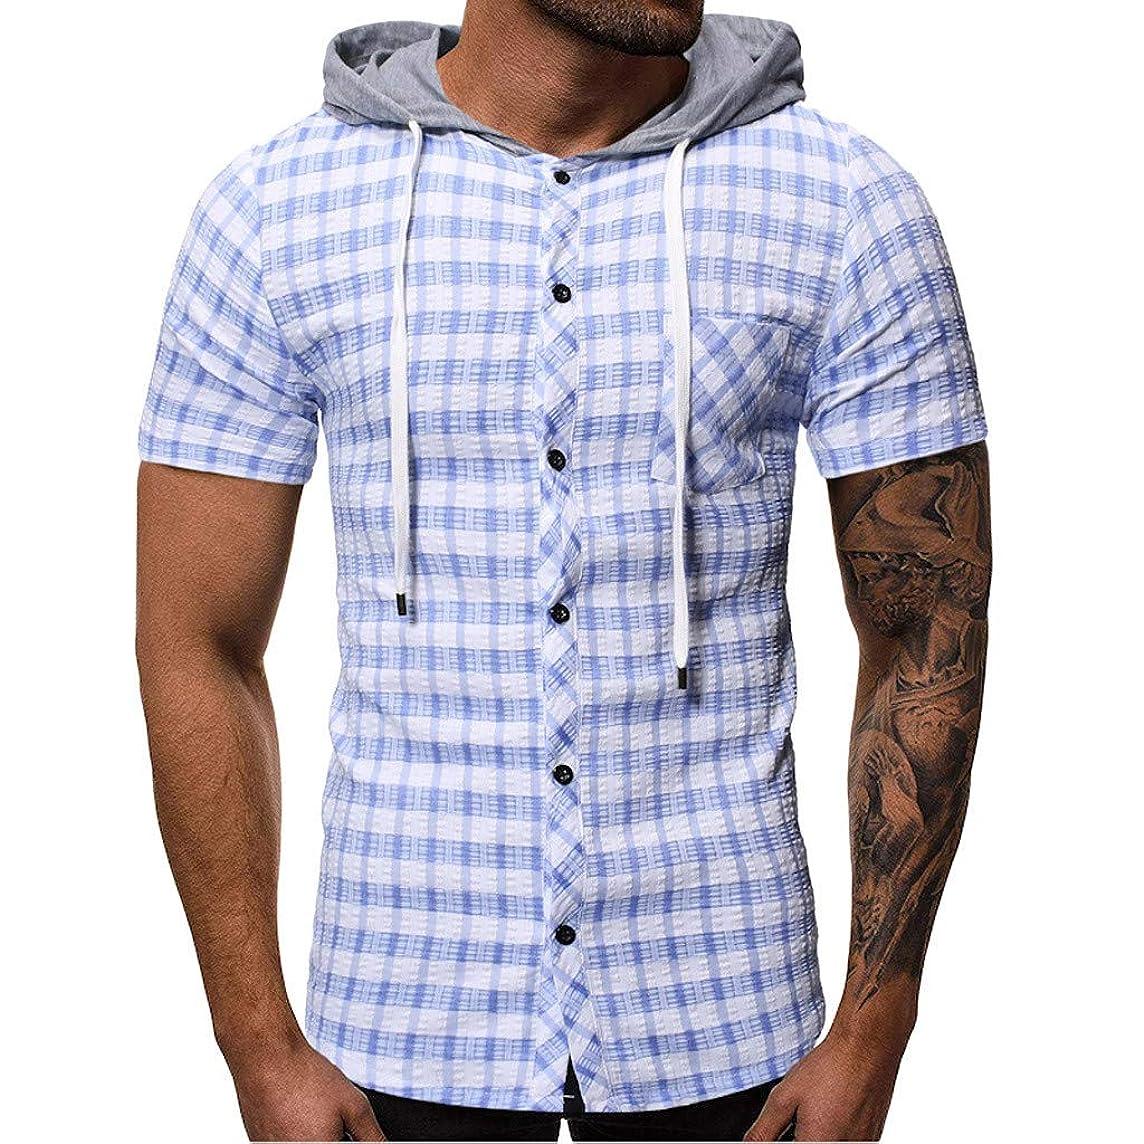 iHPH7 Men's Tops T-Shirt Blouse #19052337